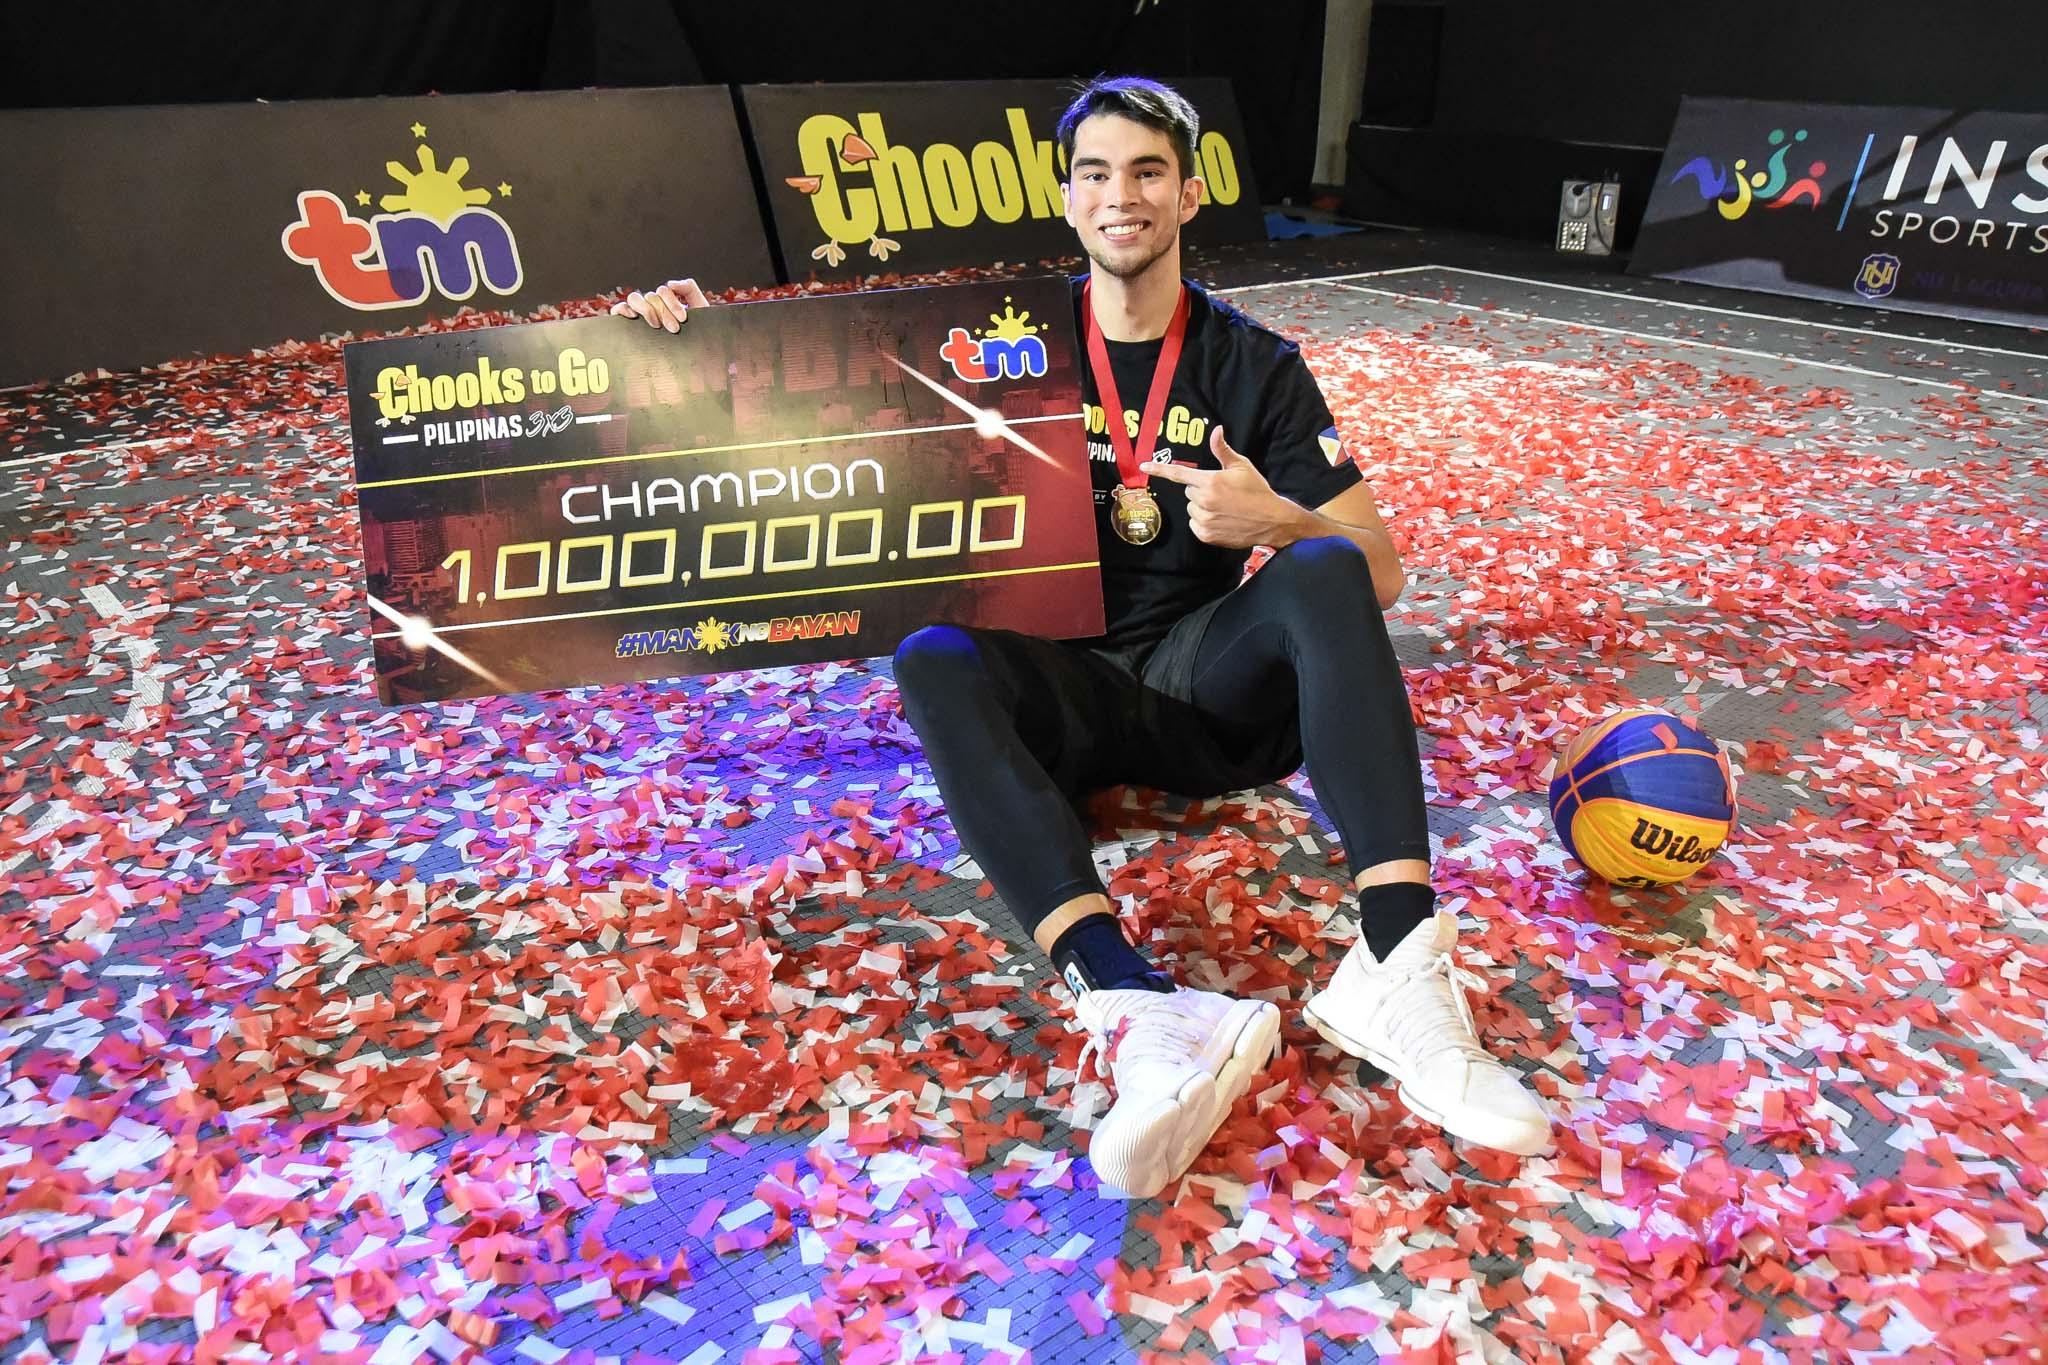 Chooks-to-Go-Pilipinas-3X3-Awarding-Rike How will Munzon, Pasaol, Santillan, and Rike spend their P1.35M winnings? 3x3 Basketball Chooks-to-Go Pilipinas 3x3 News  - philippine sports news